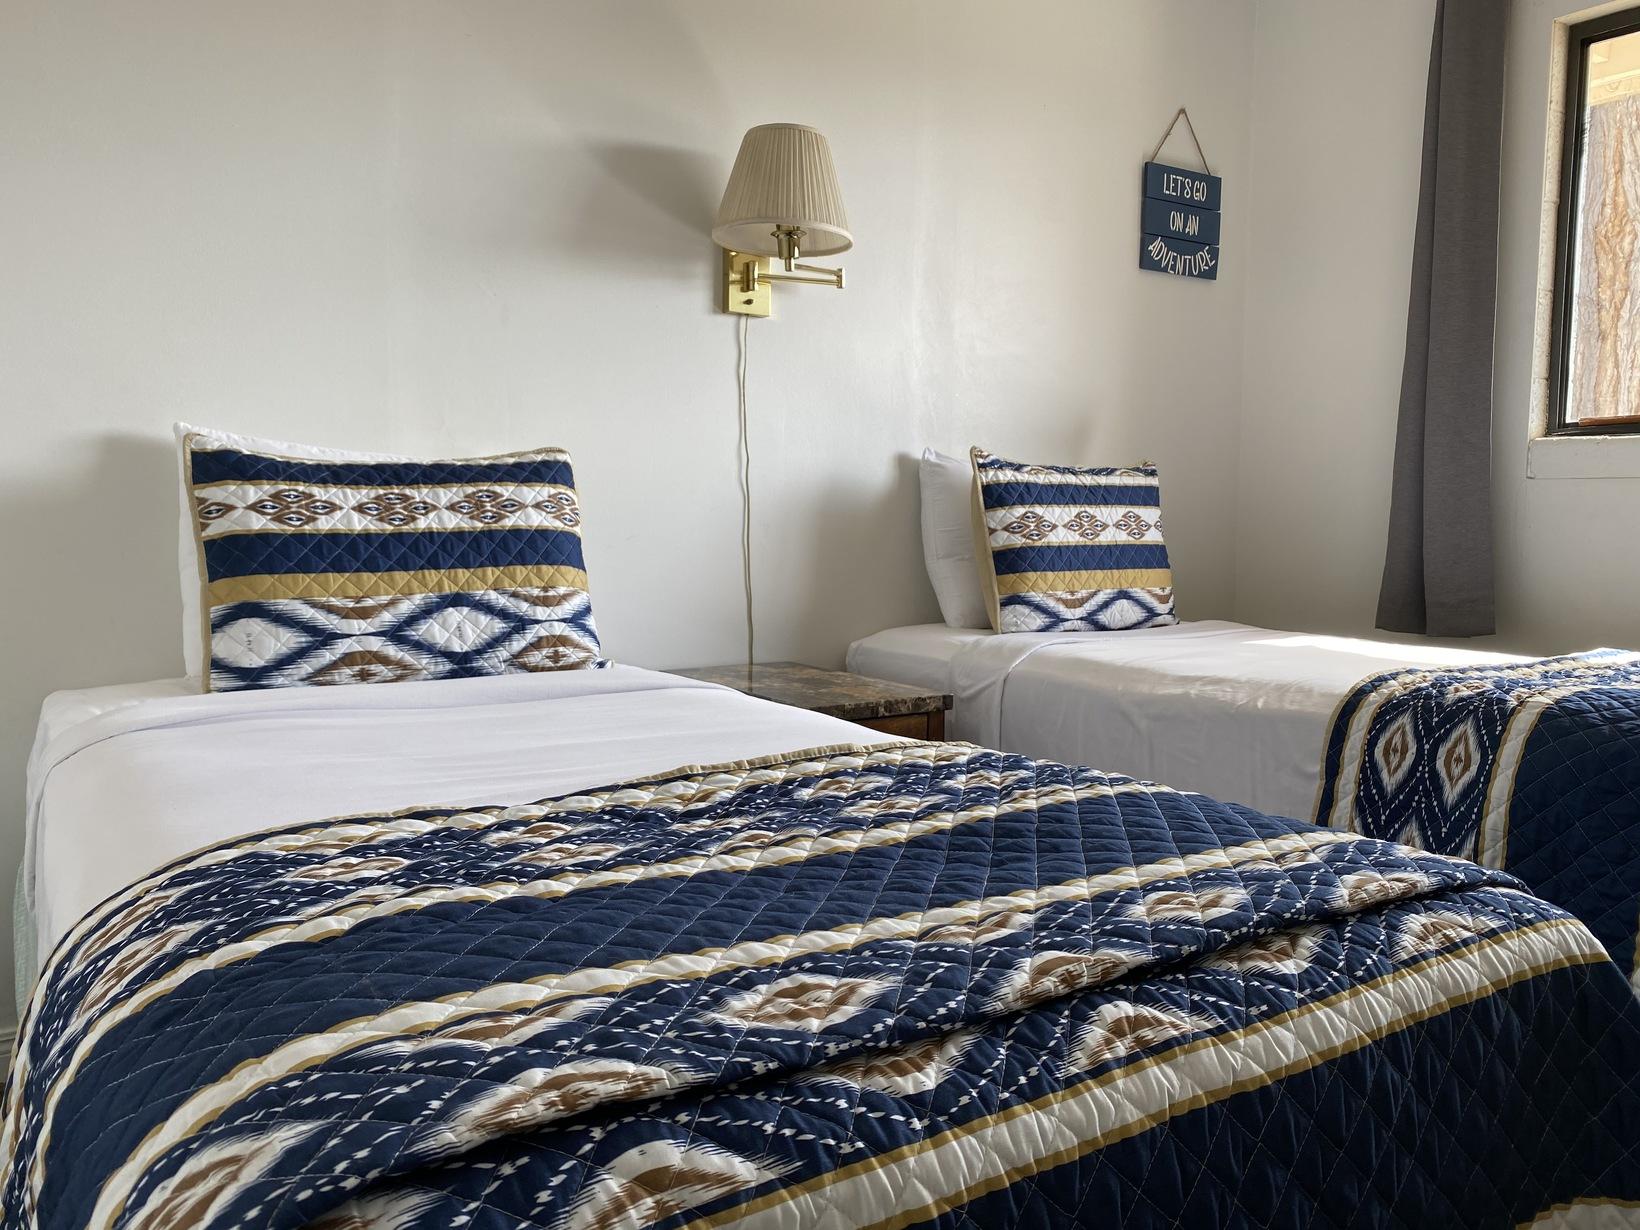 3-Bedroom Apartments